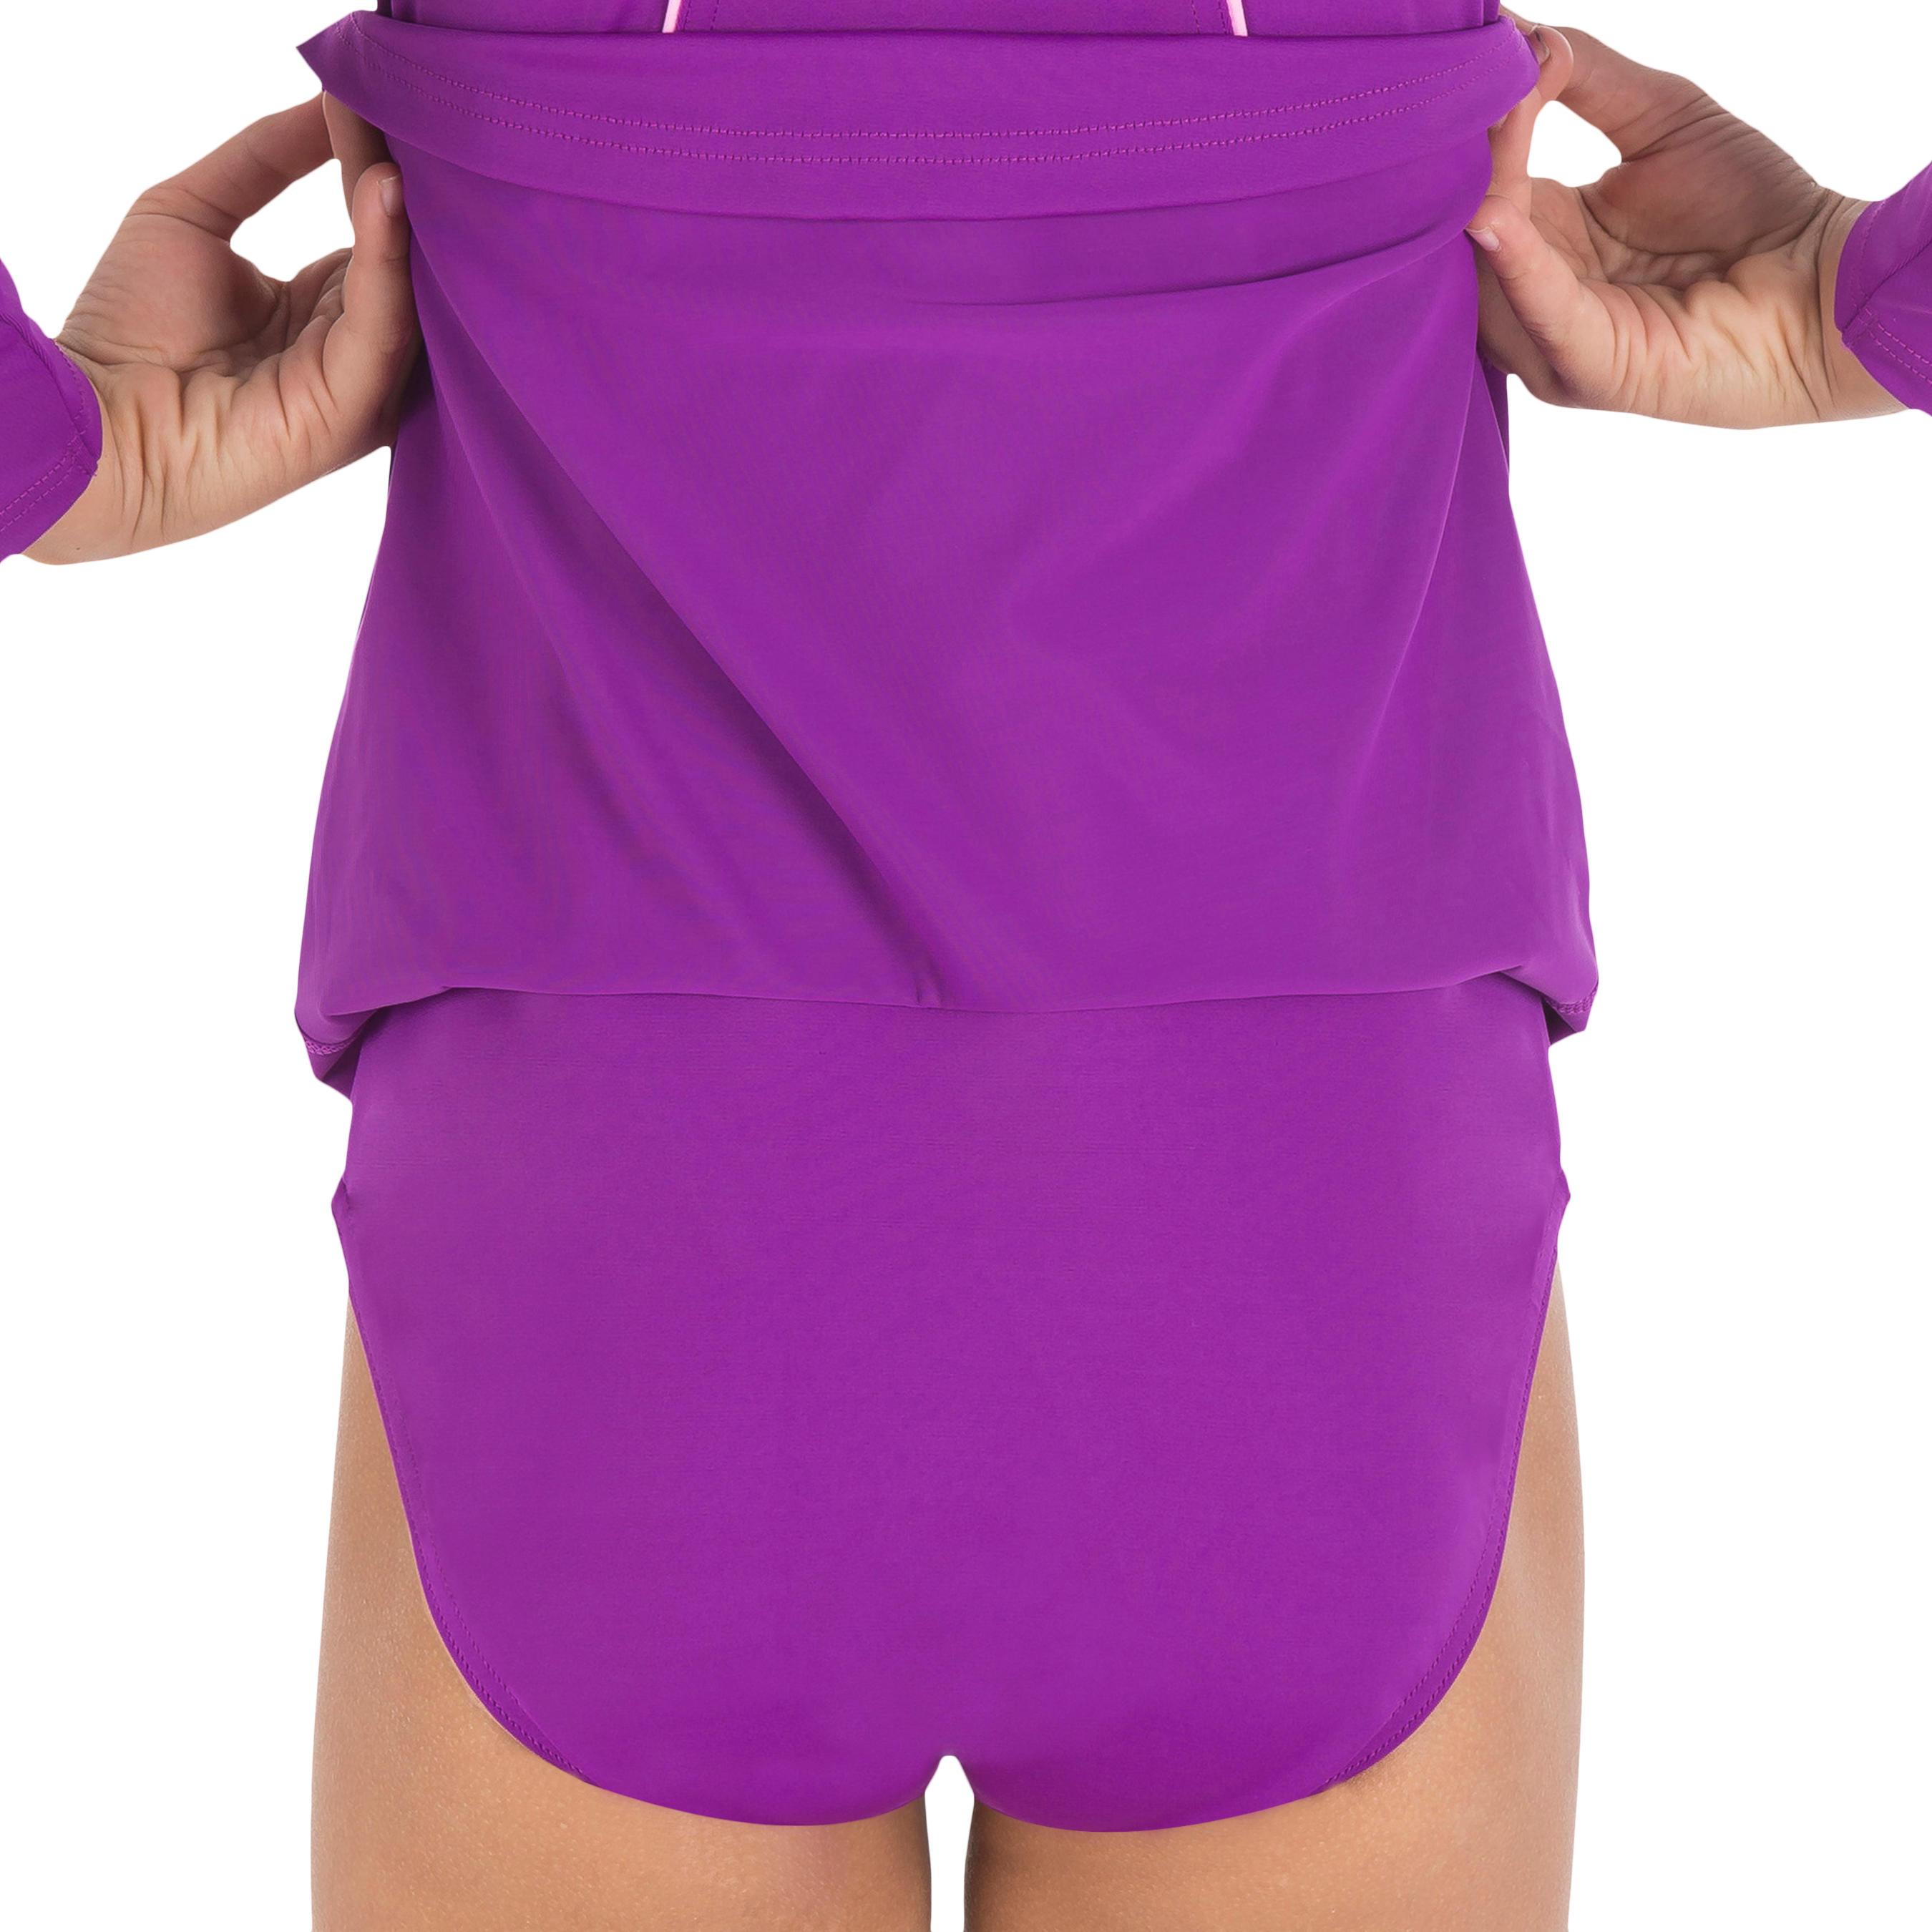 Audrey Girl's One-Piece Sleeve Swimsuit - Purple